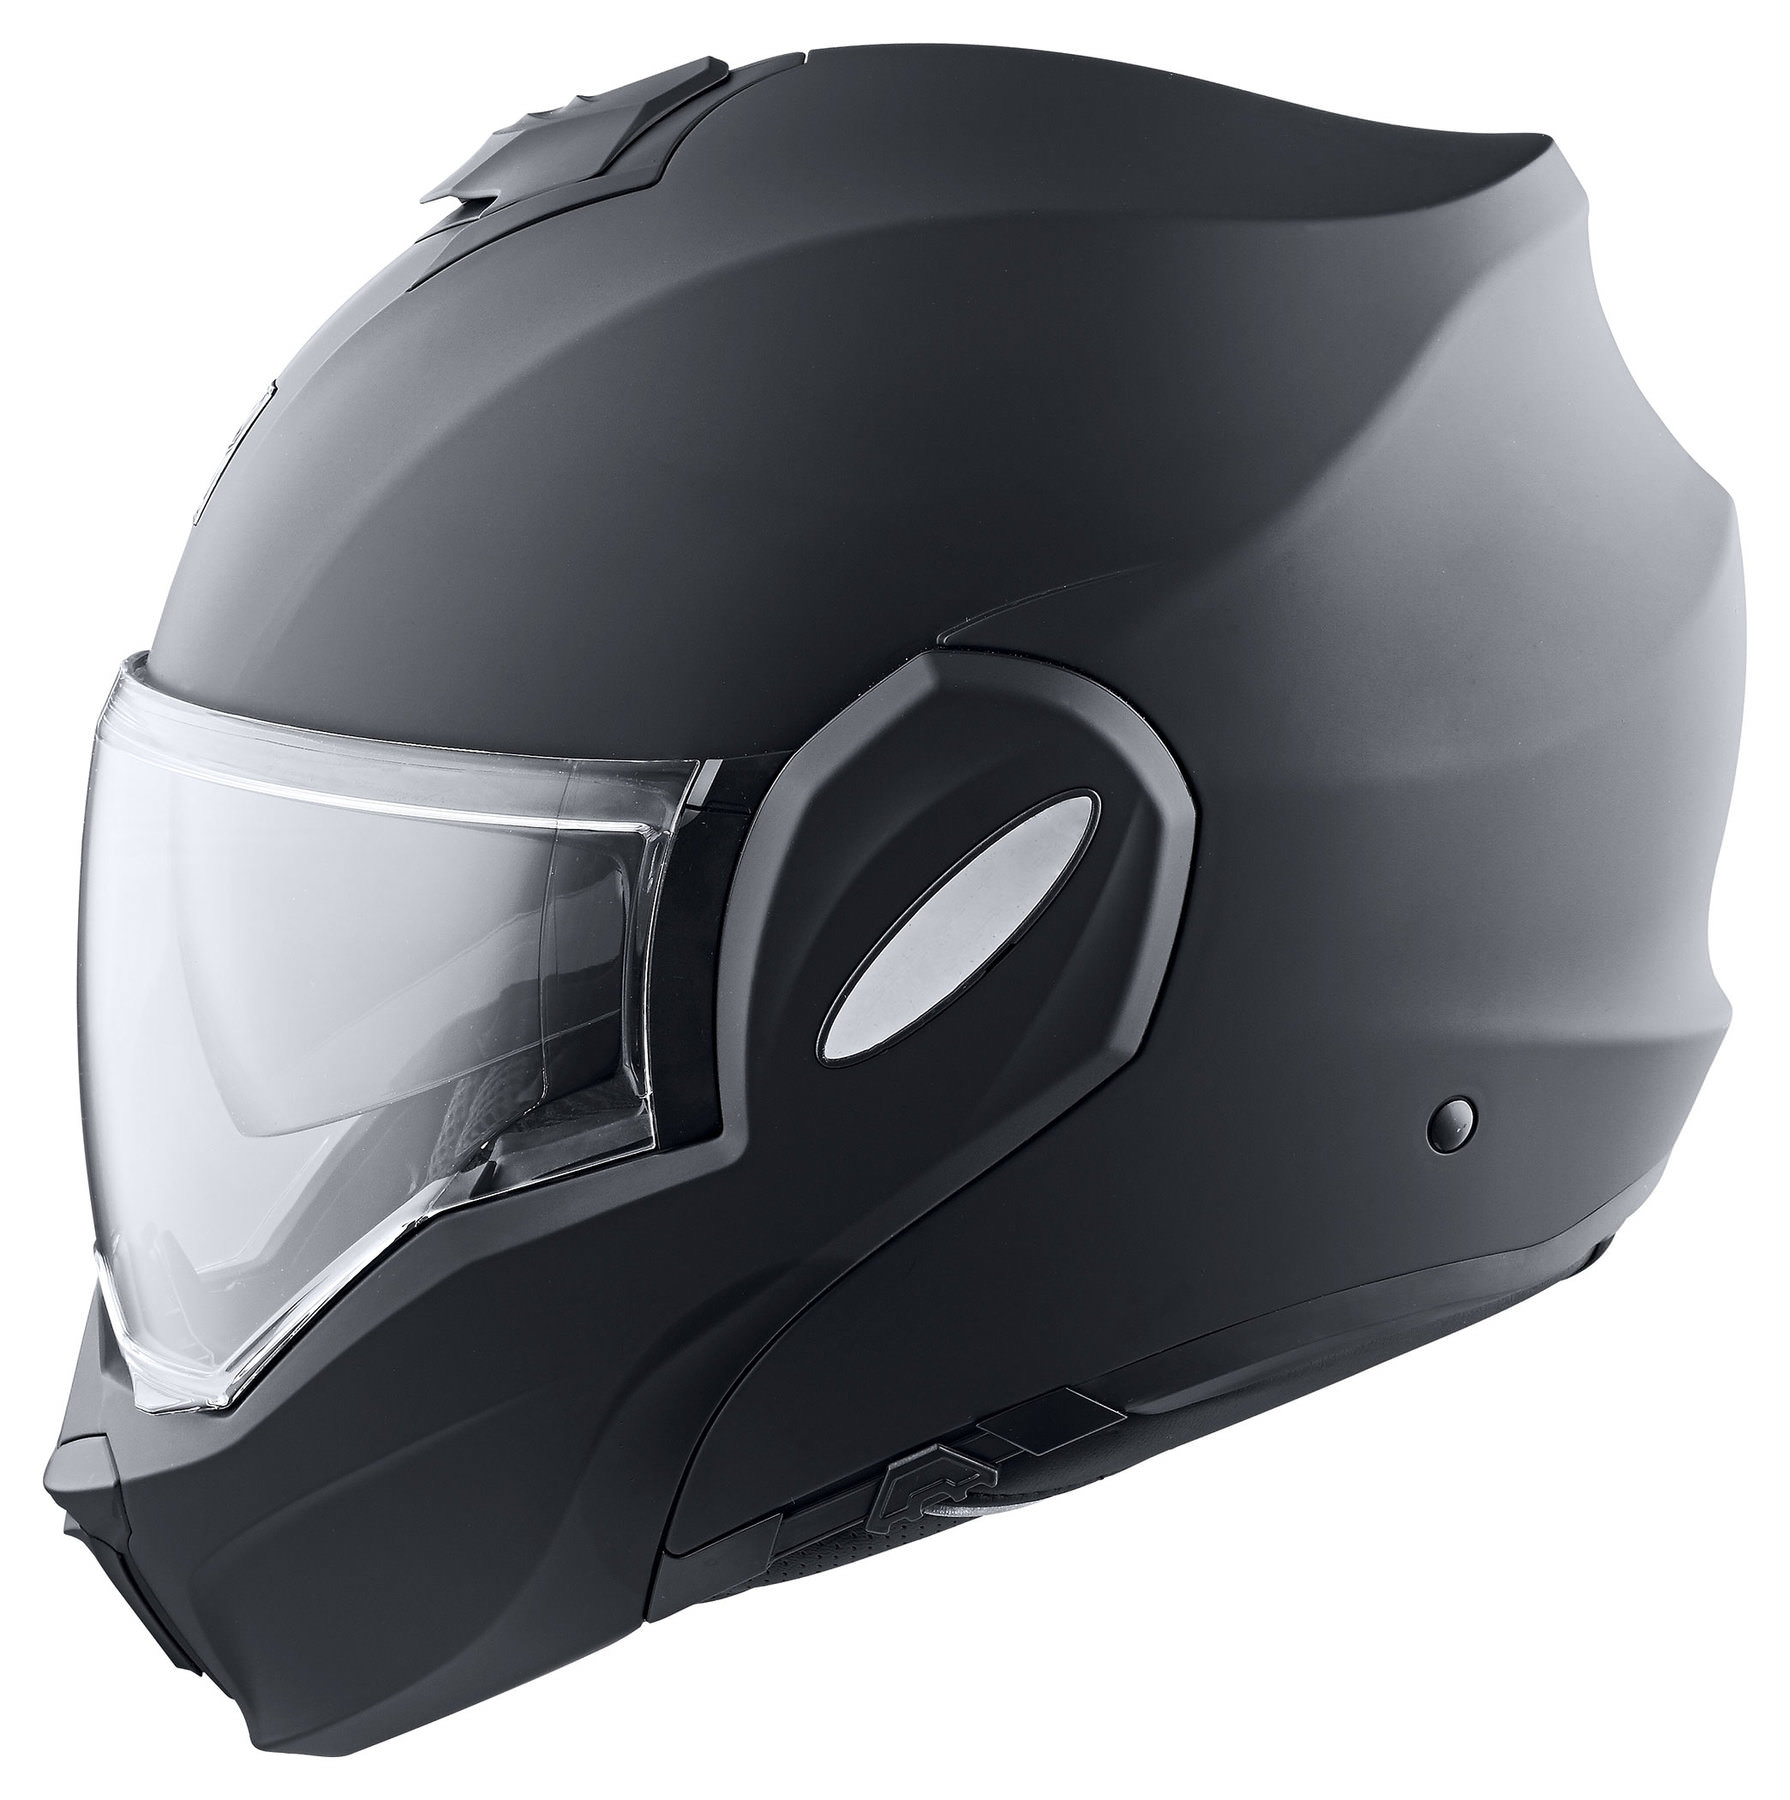 New! Scorpion EXO-TECH Solid Matte Black Modular Motorcycle Helmet Flip-Up